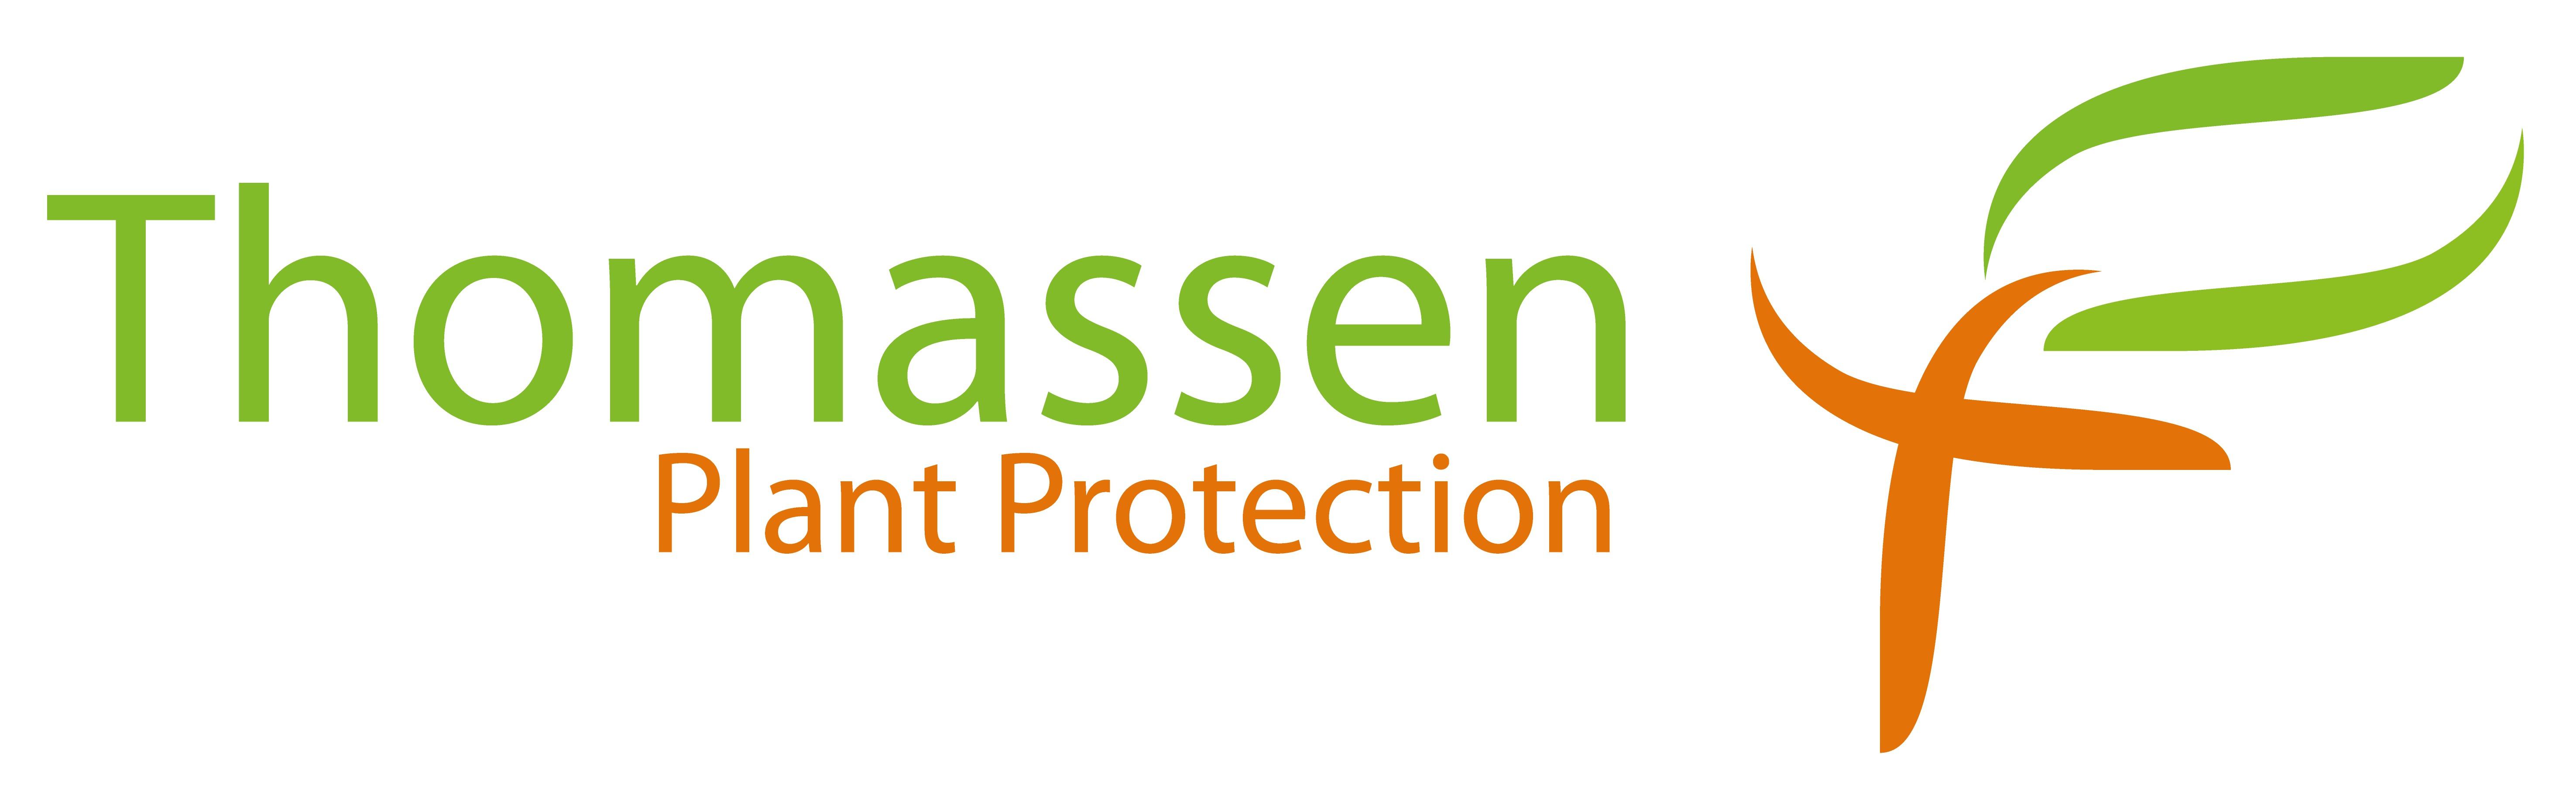 Thomassen Plant Protection